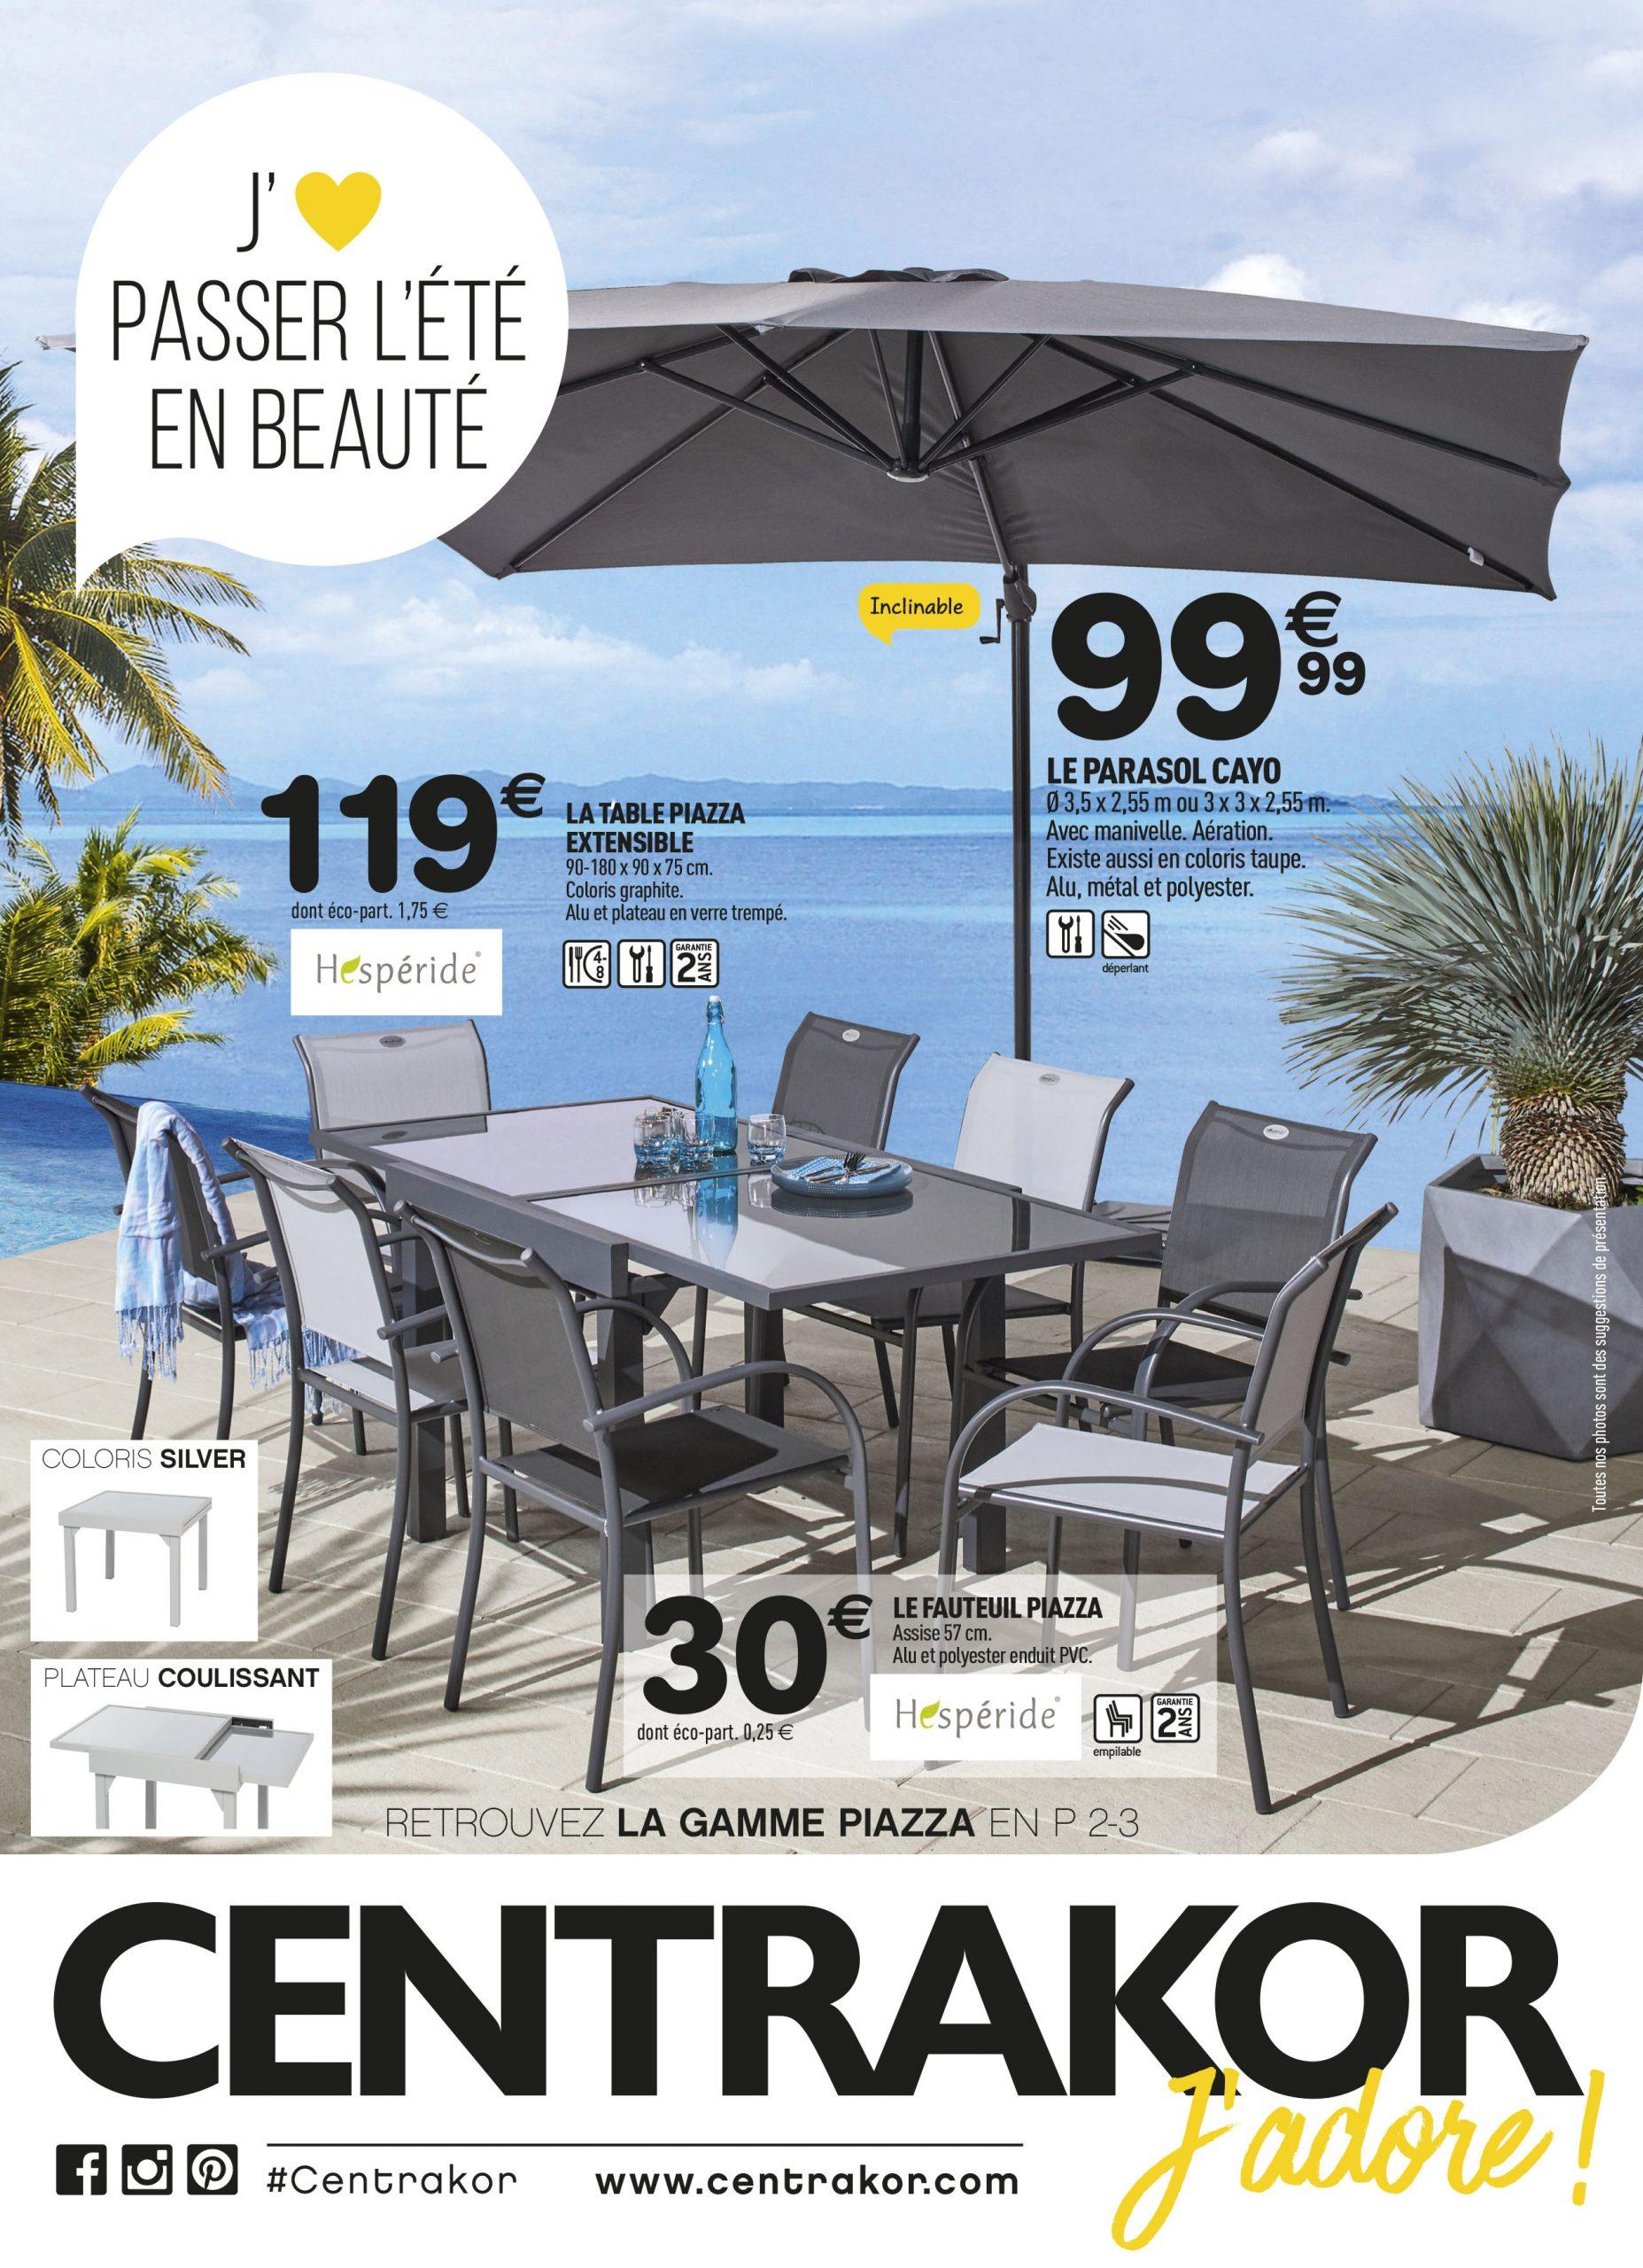 Direction Le Jardin Et La Terrasse ! | Centrakor Vannes ... encequiconcerne Table De Jardin Centrakor